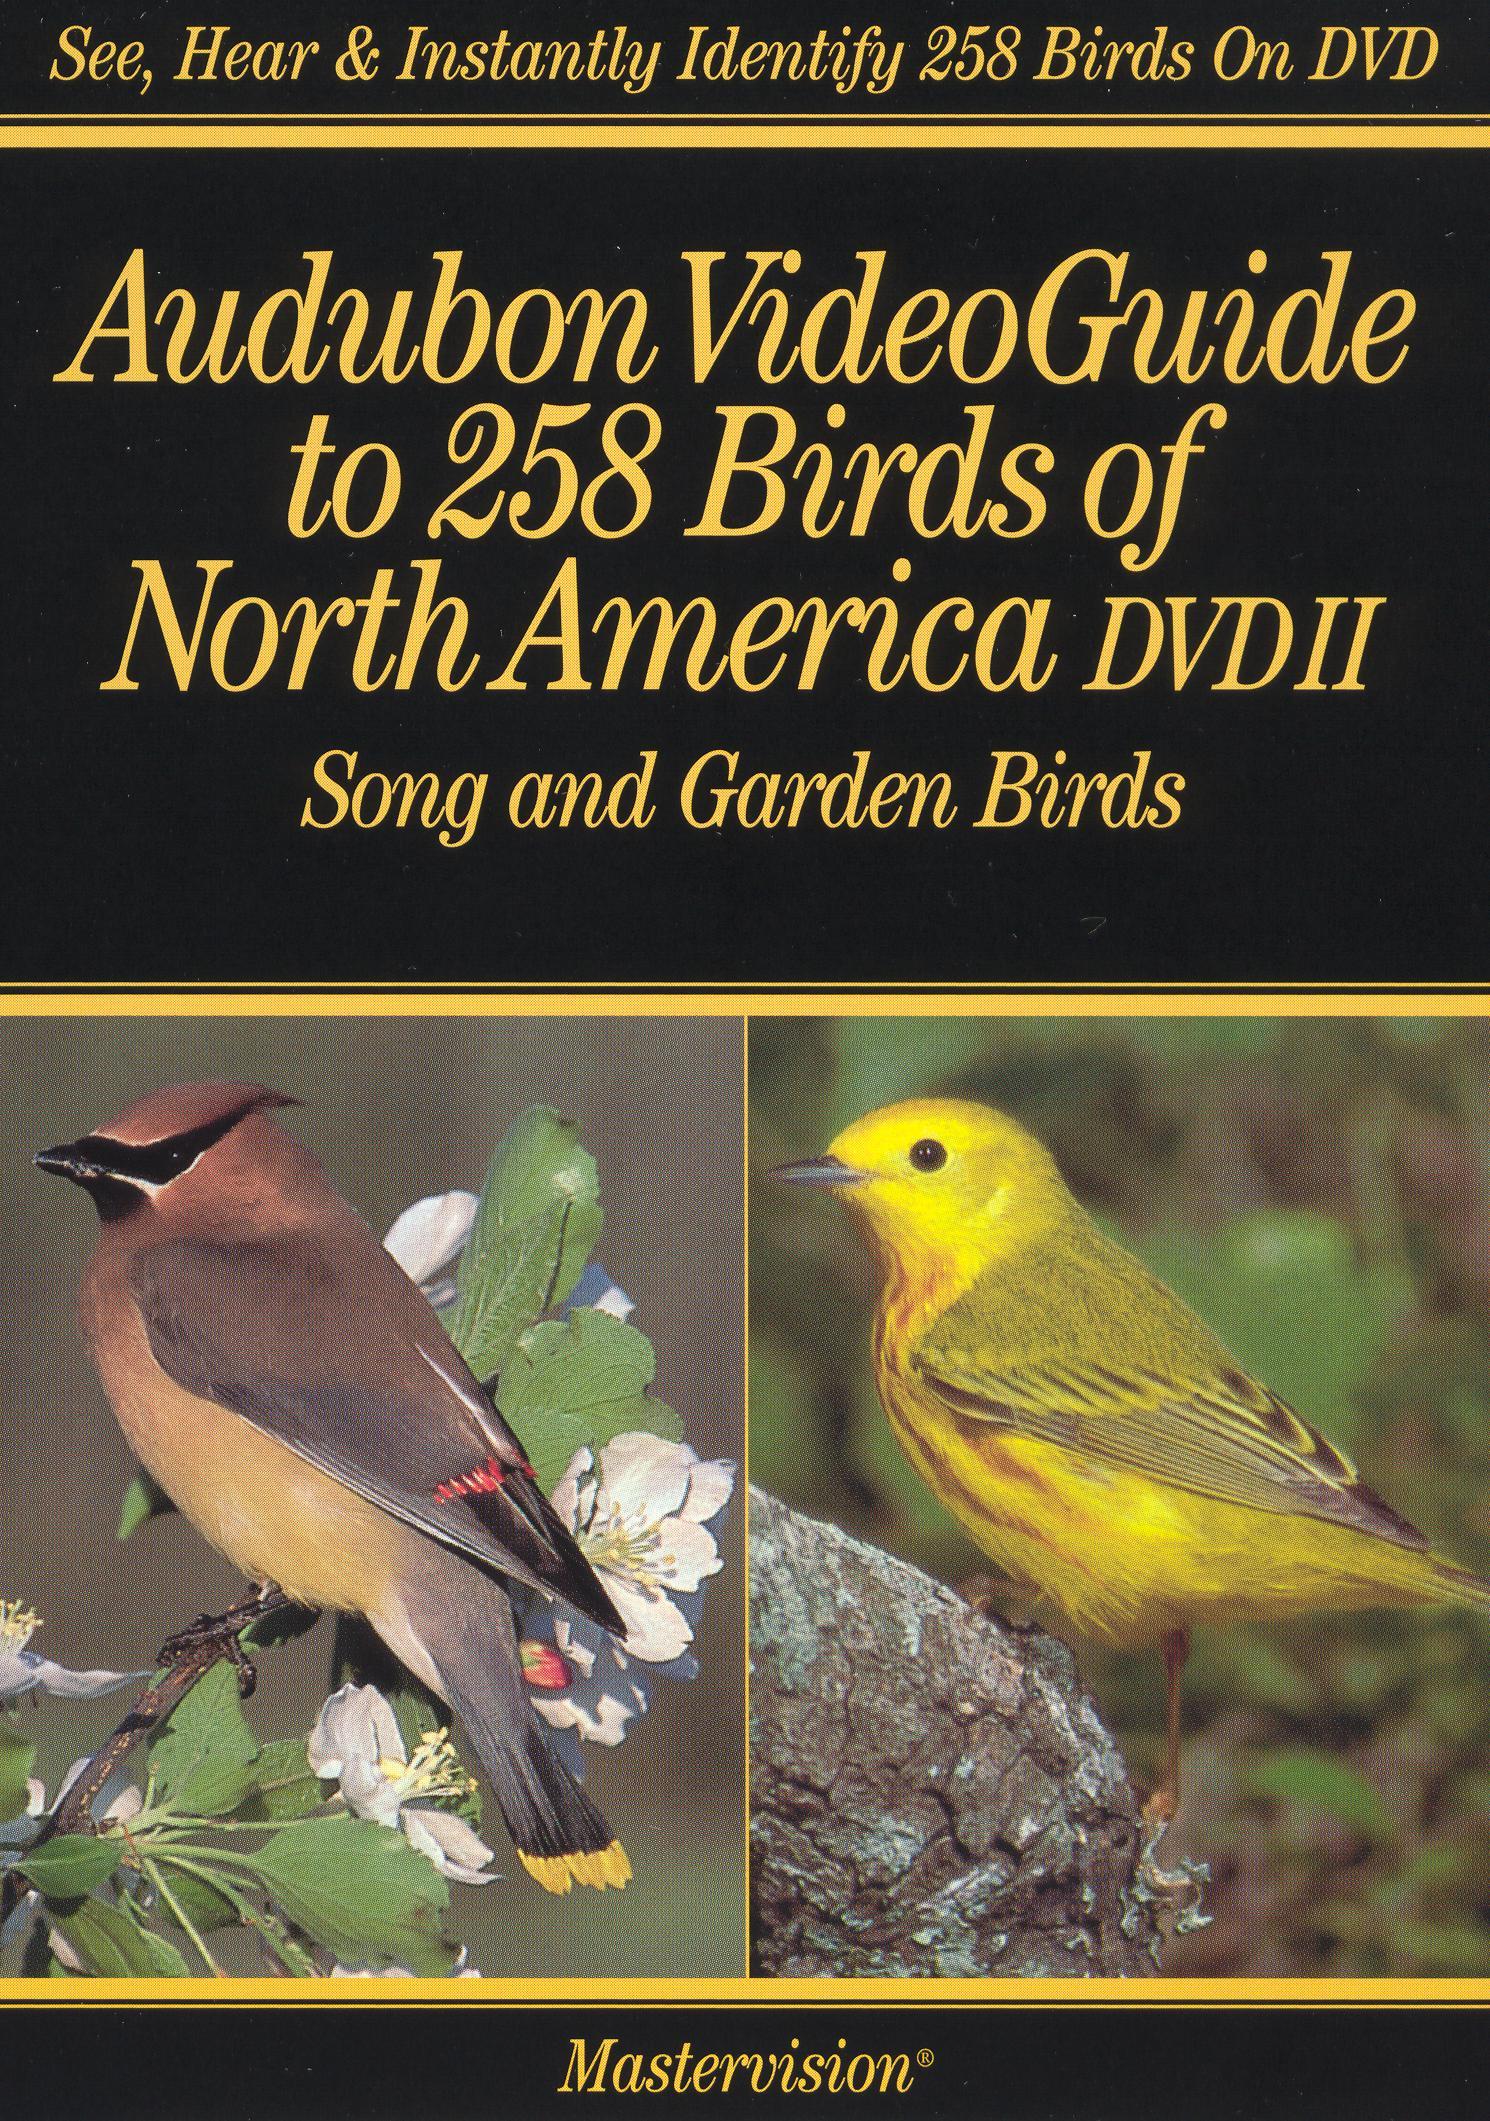 Audubon, Vol. 2: Video Guide to 258 Birds of North America